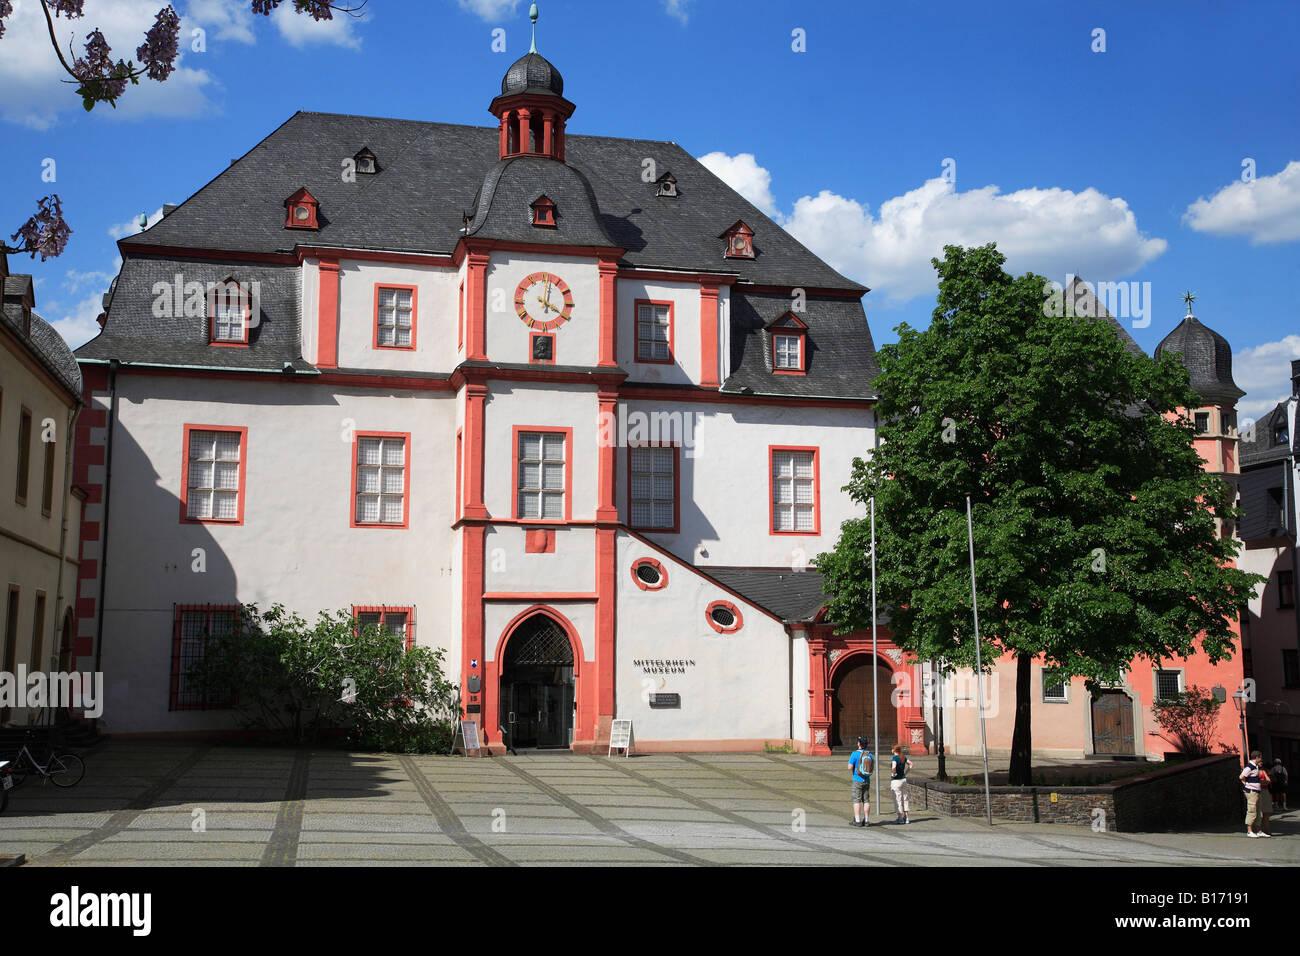 Germany Rhineland Palatinate Koblenz Florinsmarkt Mittelrhein Museum Stock Photo, Royalty Free